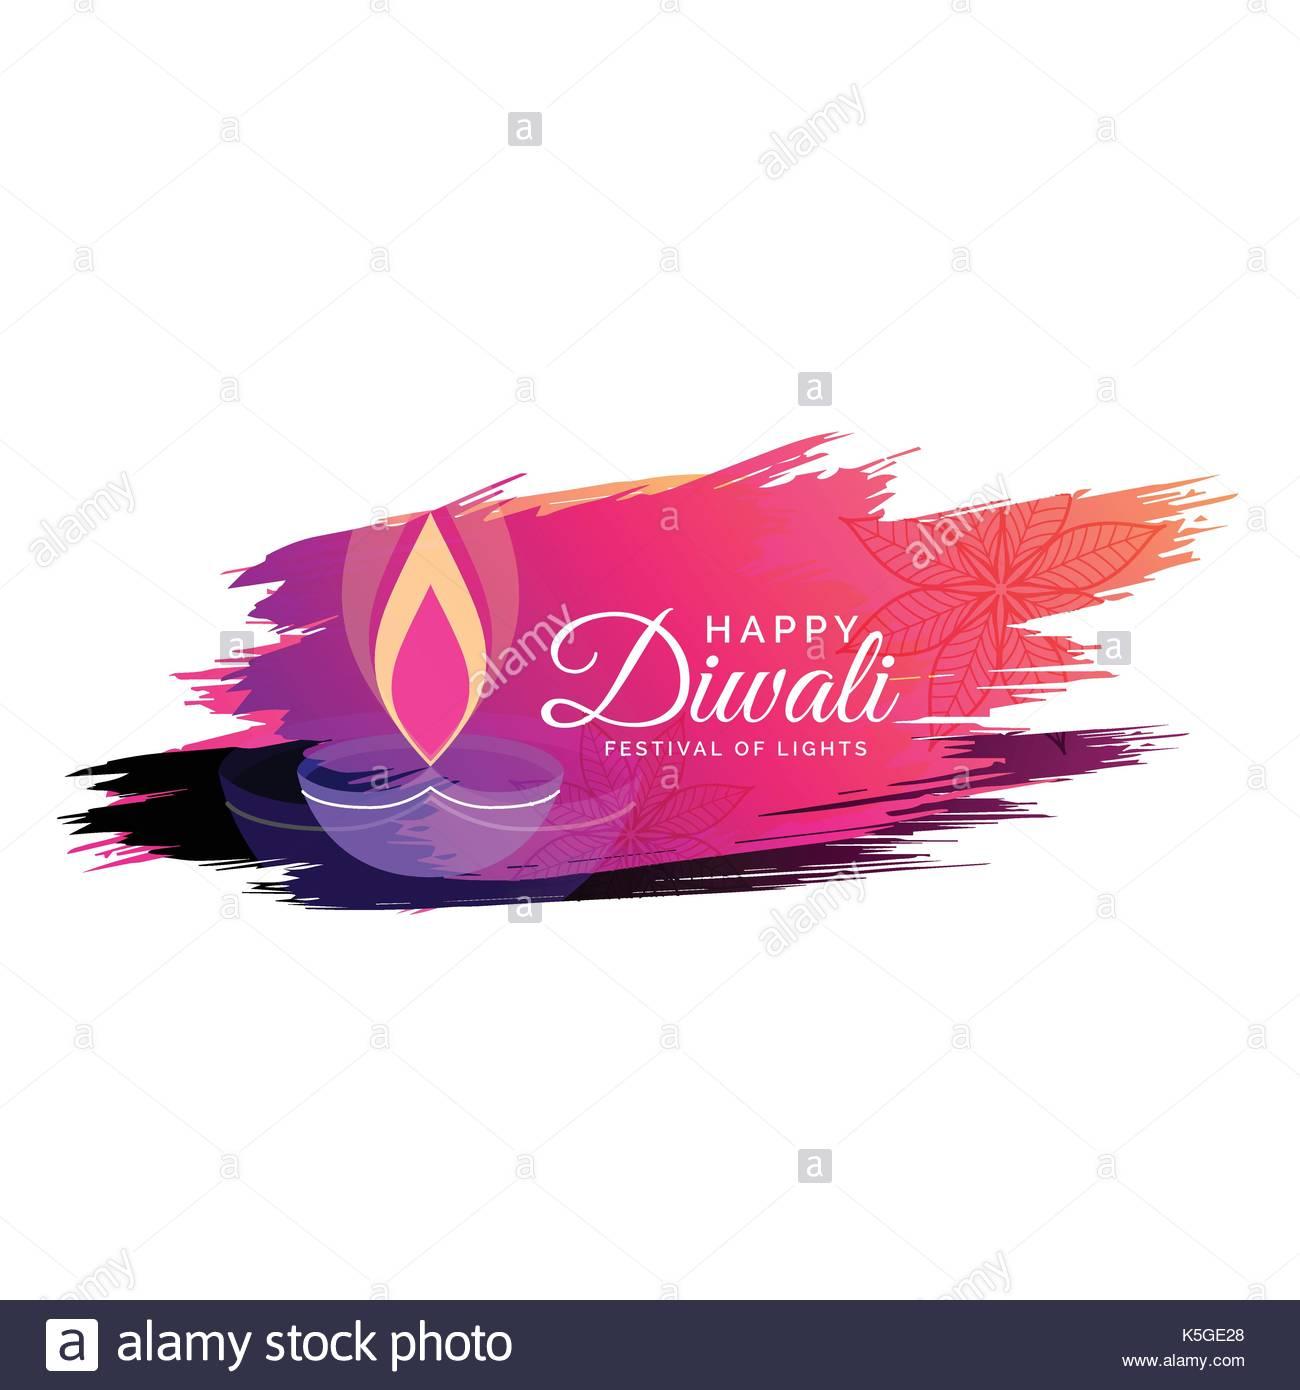 Creative Watercolor Diwali Festival Greeting Card Design With Diya